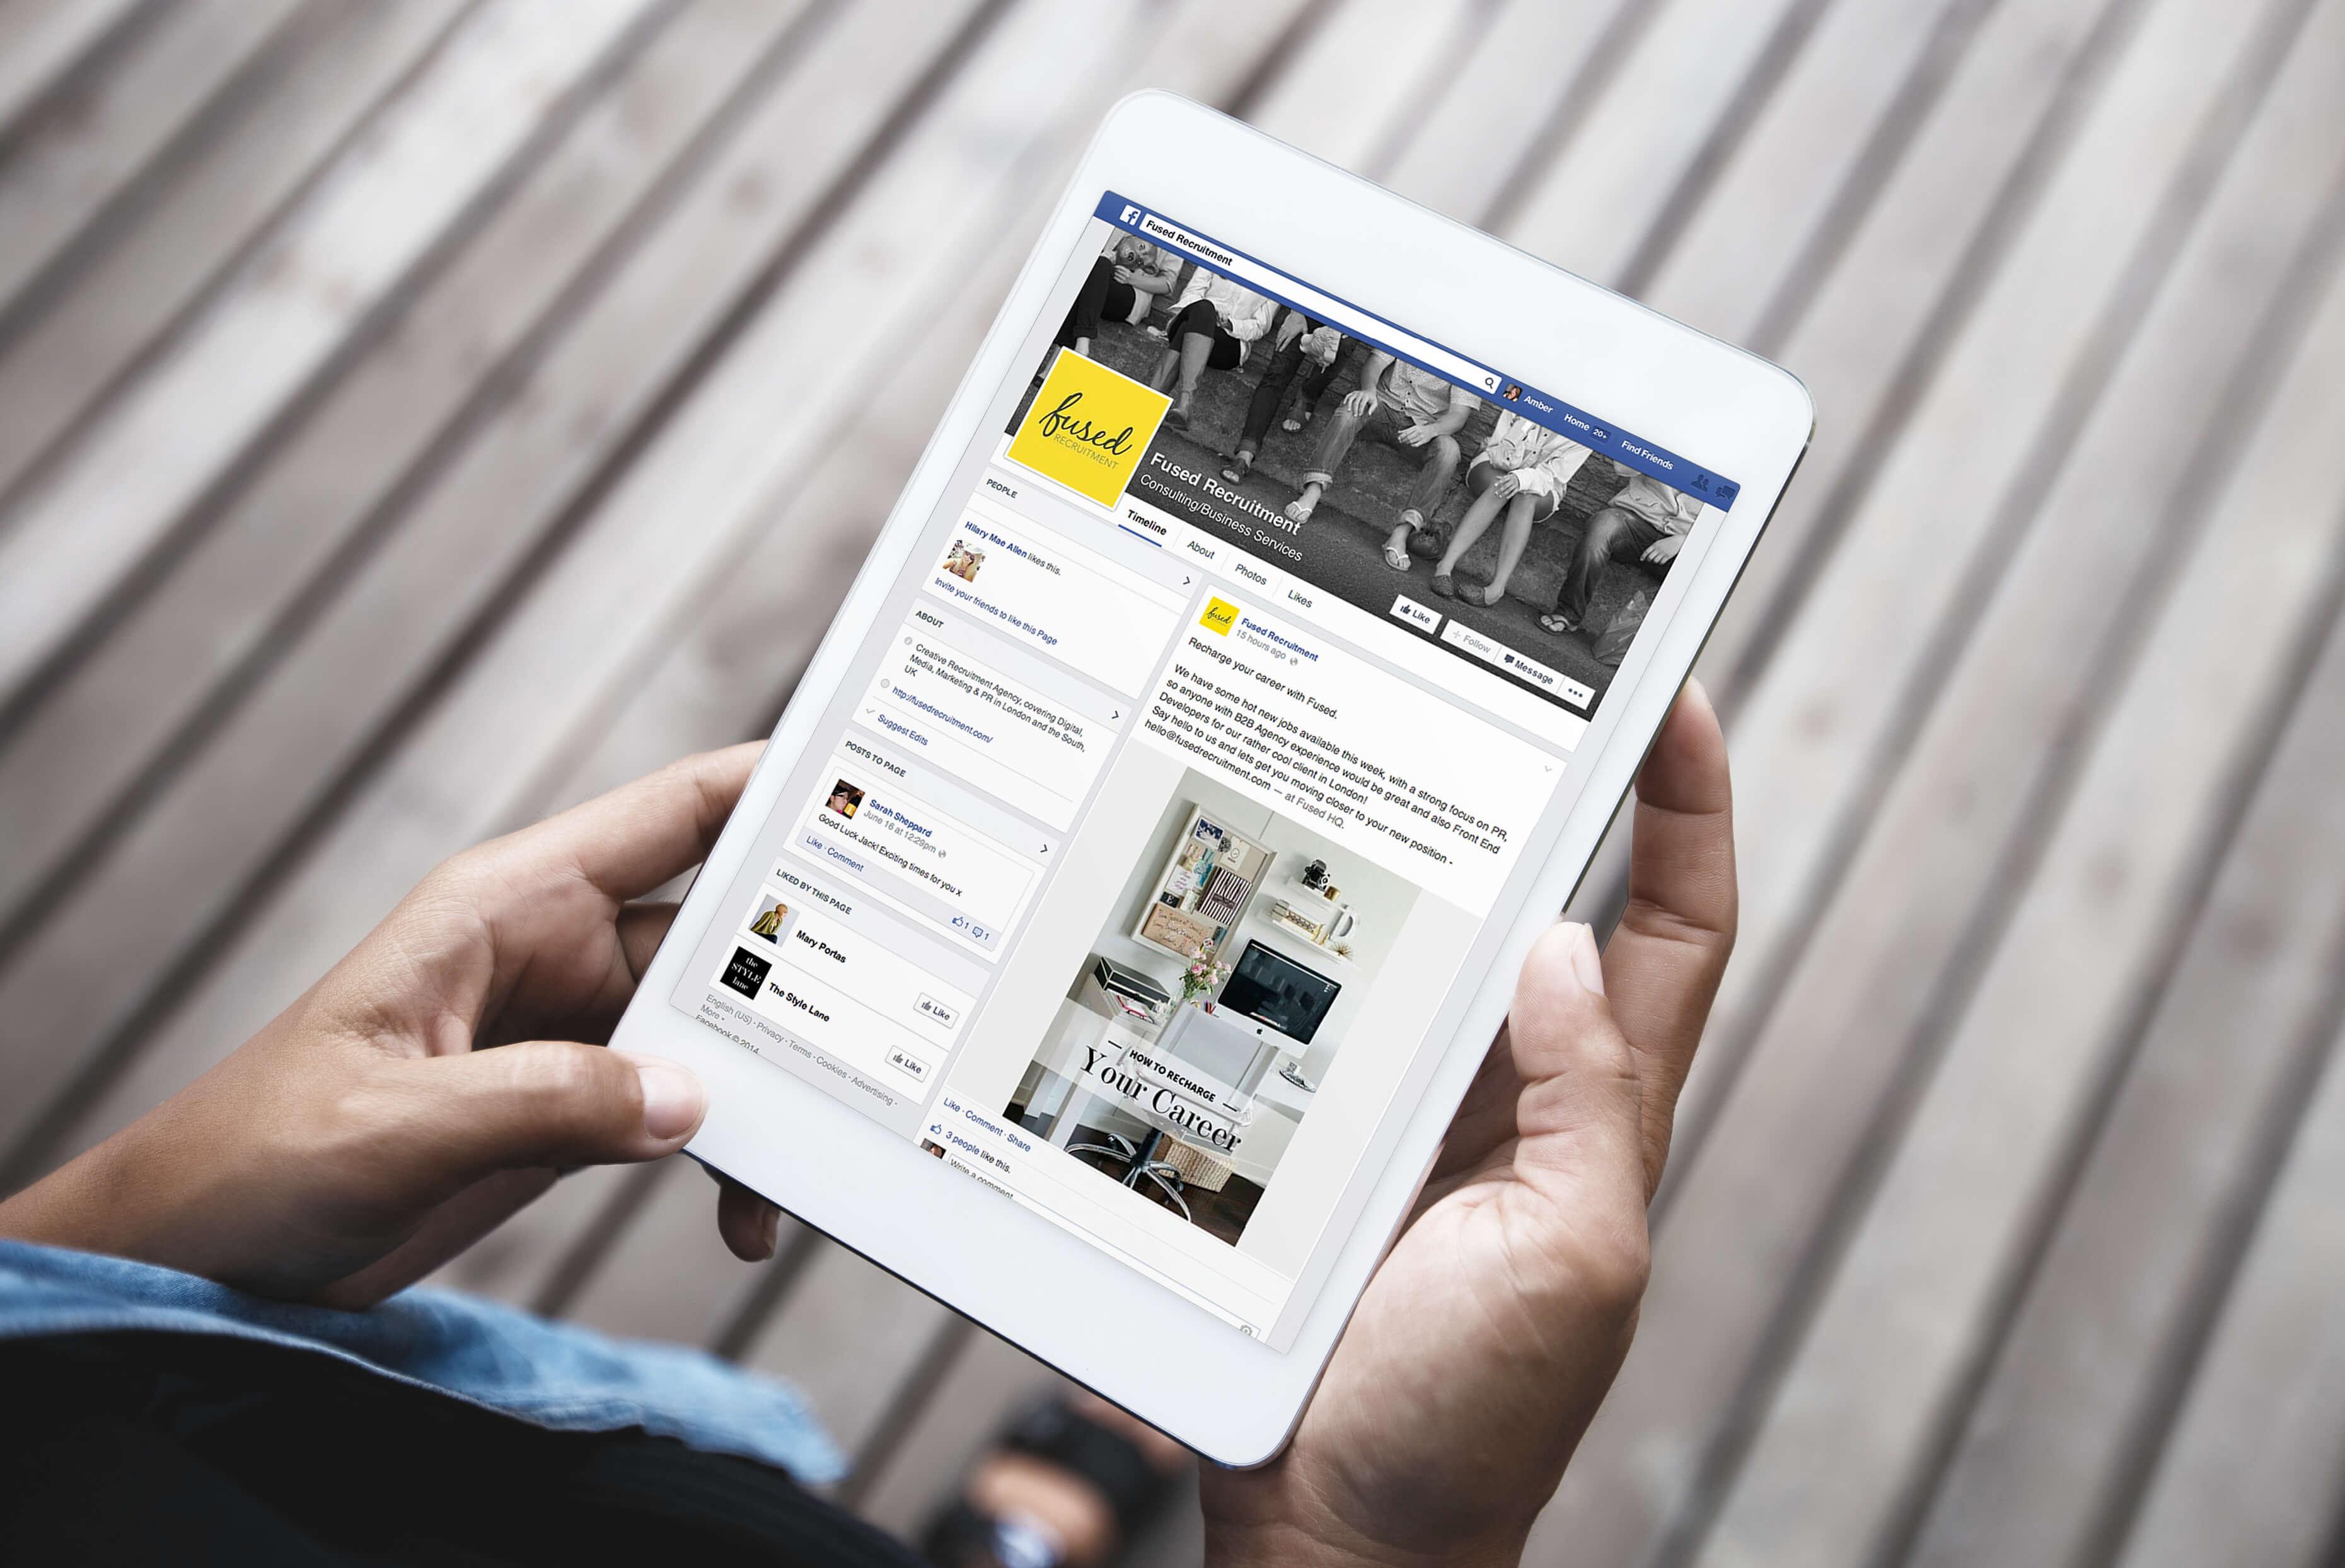 Fused Recruitment Facebook   Fused Recruitment Branding   Independent Marketing - IM London   London Branding Agency